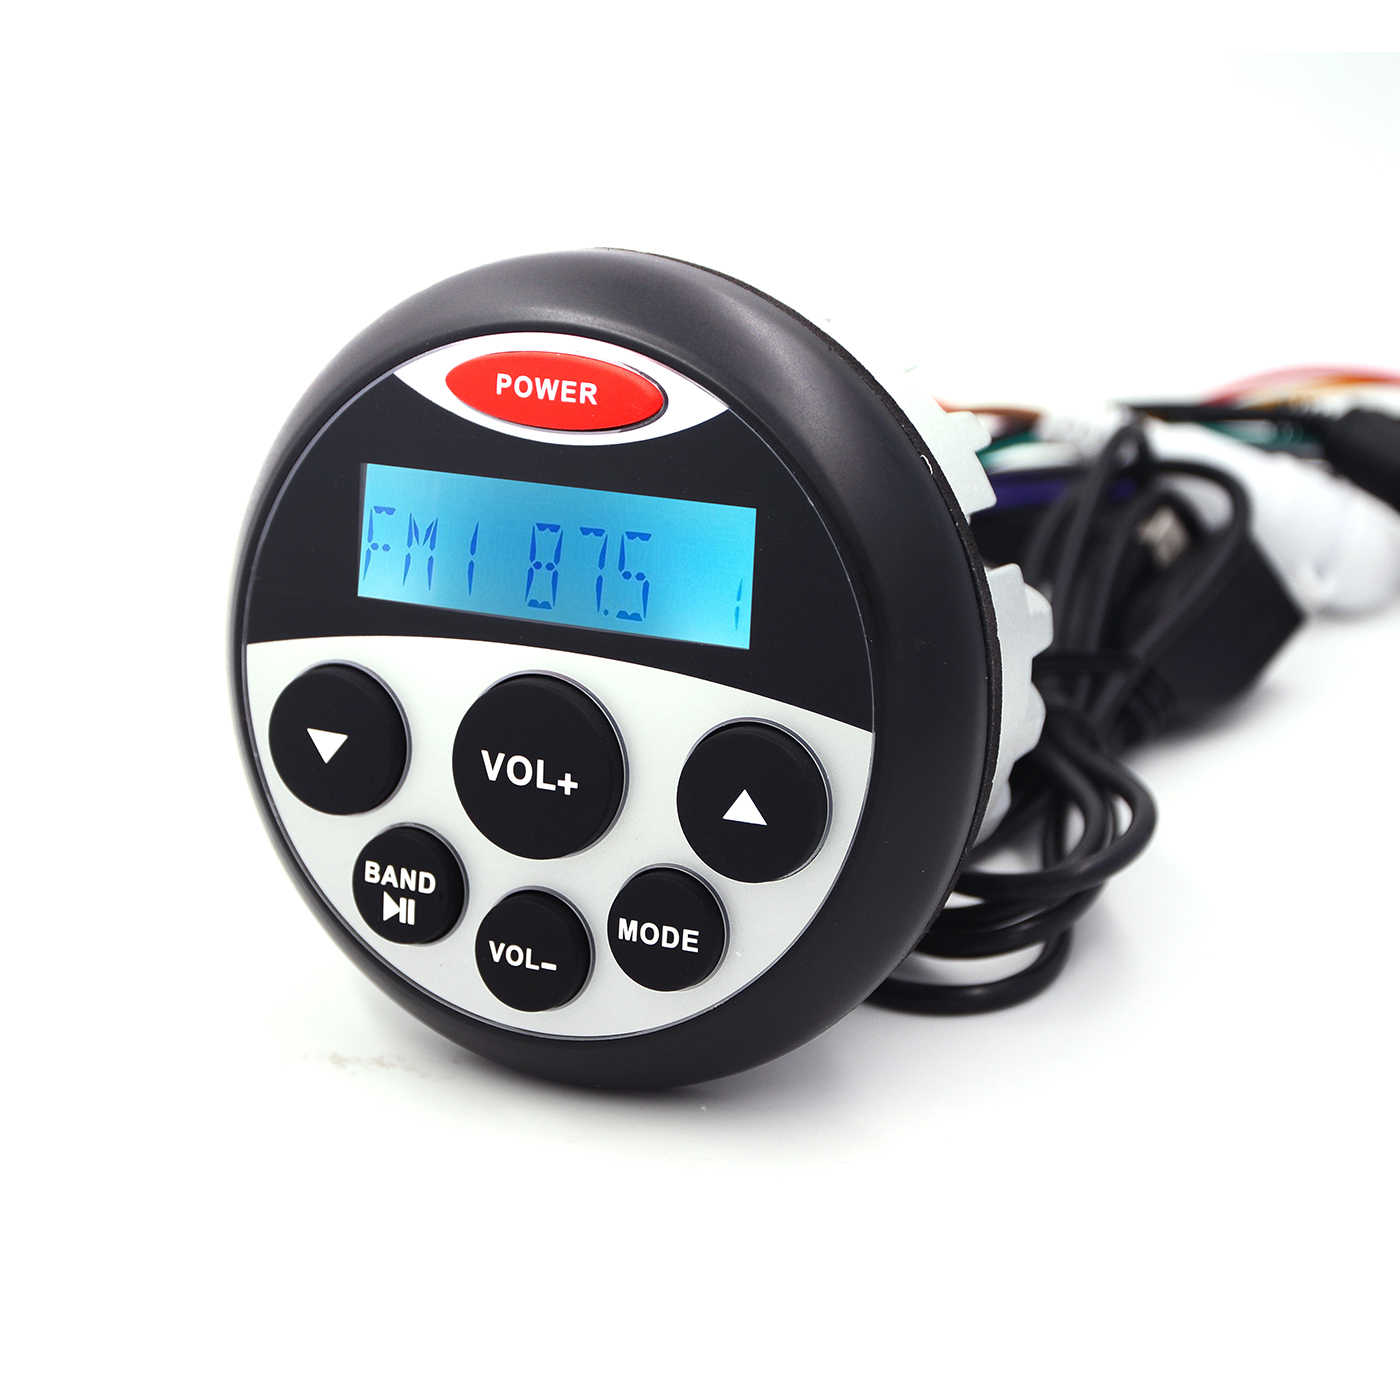 Guzare マリン防水 Bluetooth ステレオラジオオーディオの FM 、 AM 受信機車 MP3 プレーヤー用オートバイボートスパ ATV UTV